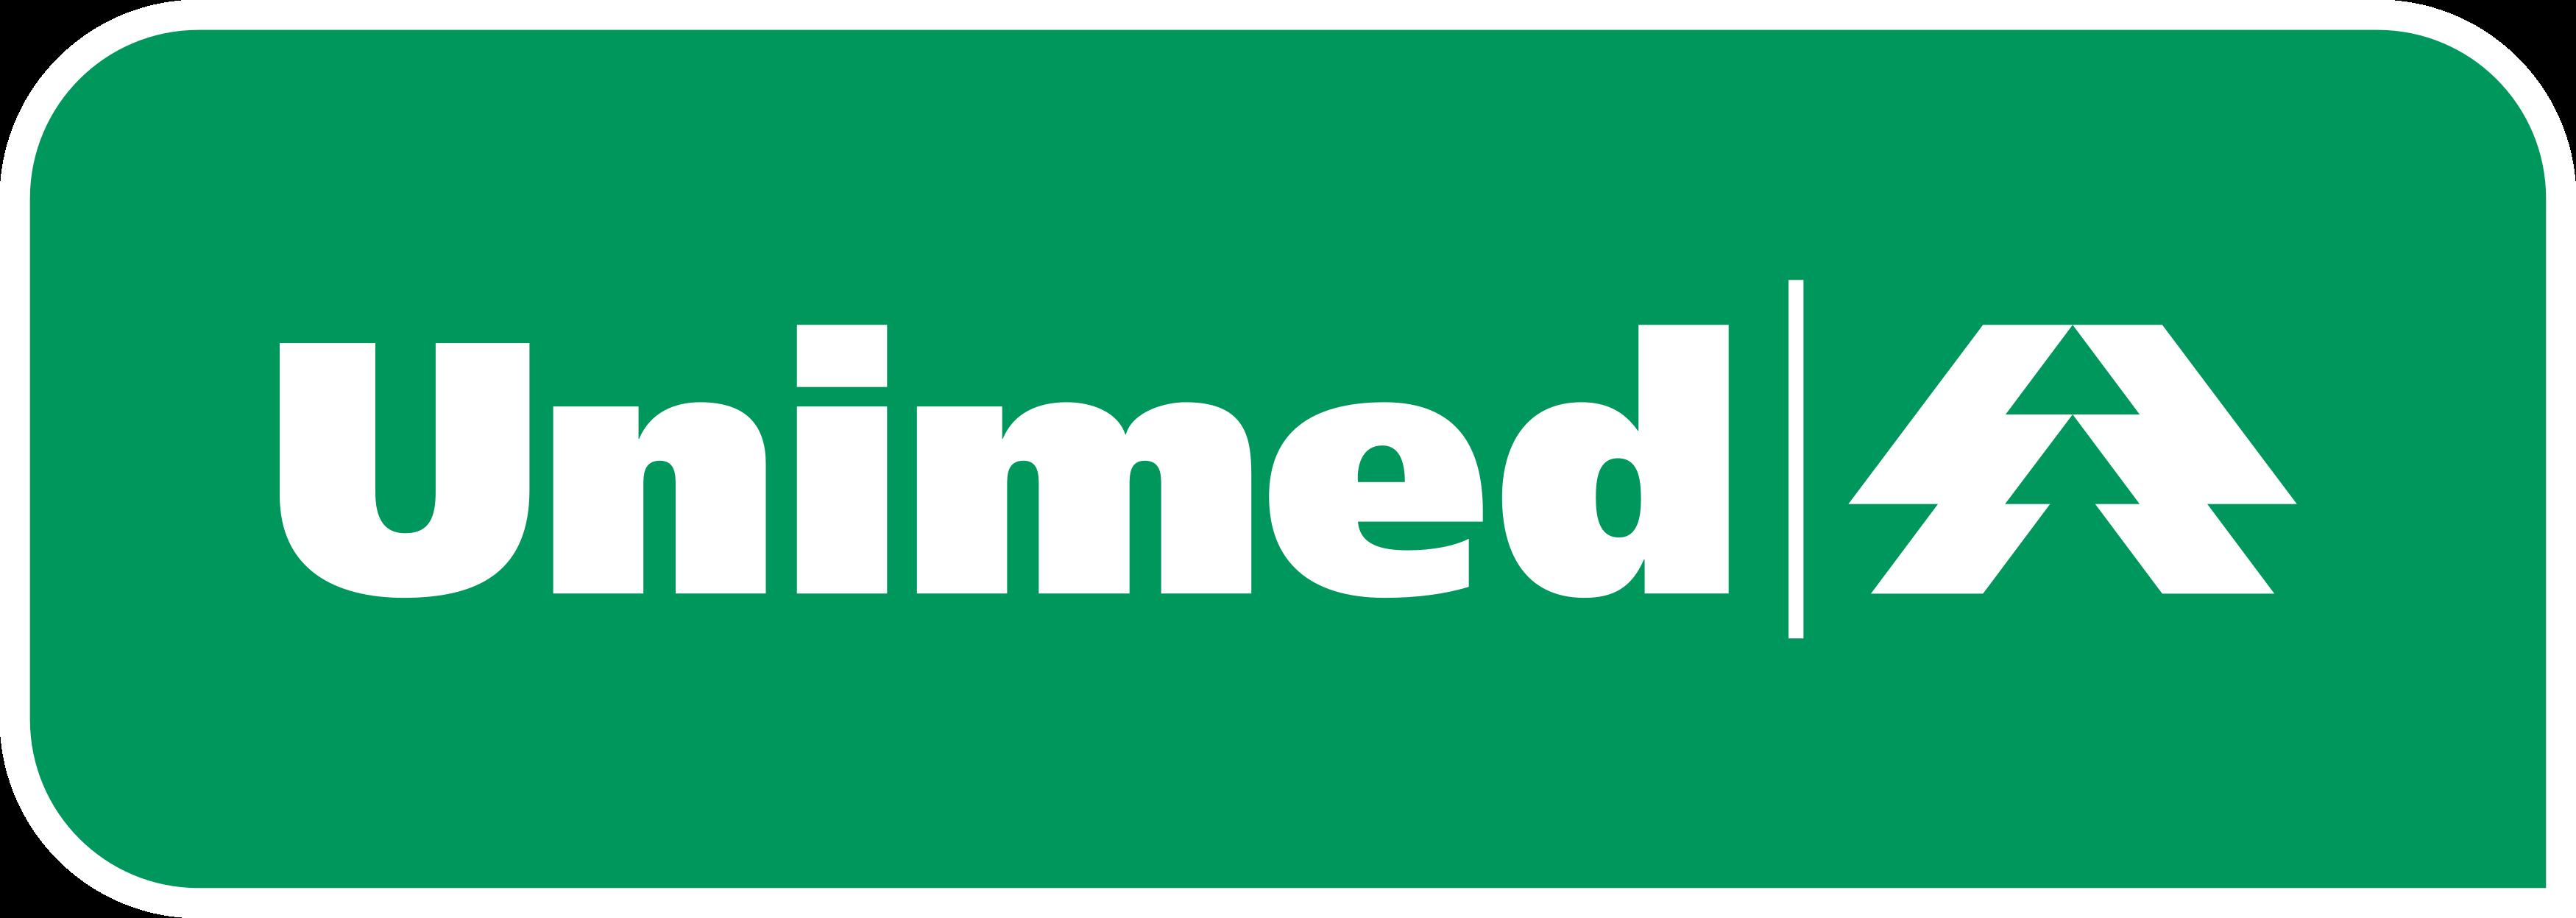 unimed logo 1 - Unimed Logo